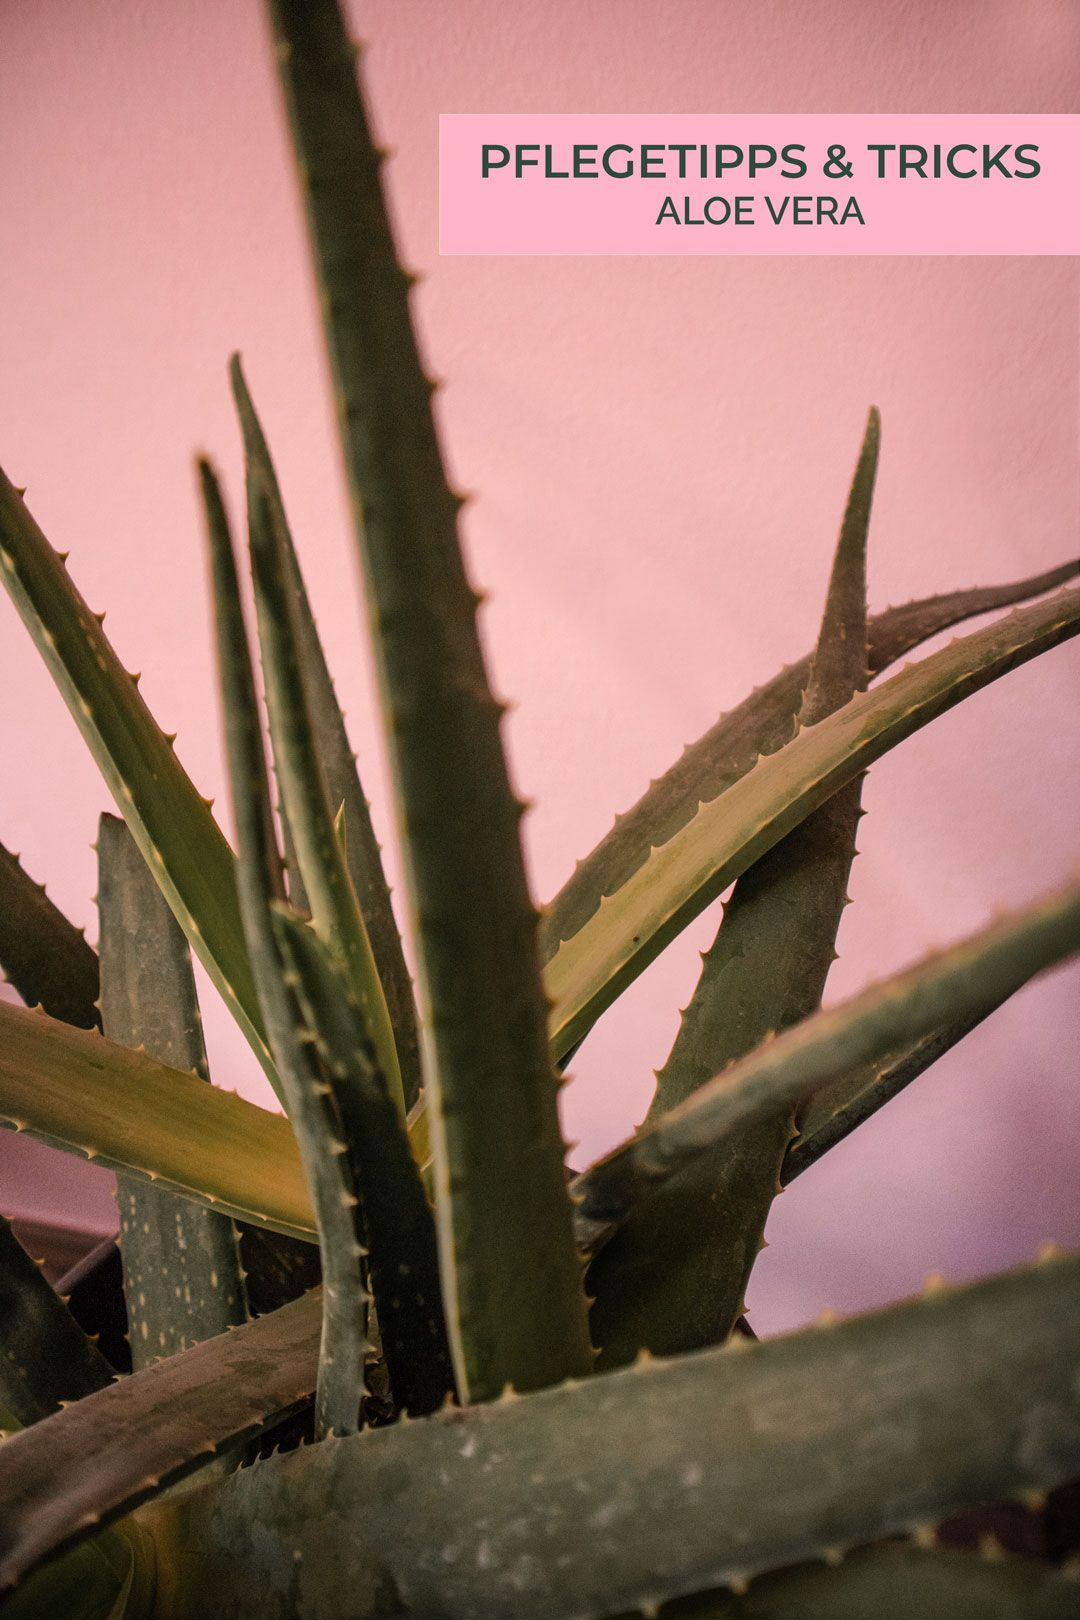 Pflegetipps Tricks Aloe Vera Aloe Vera Pflanze Pflege Aloe Vera Pflanze Aloe Vera Ableger